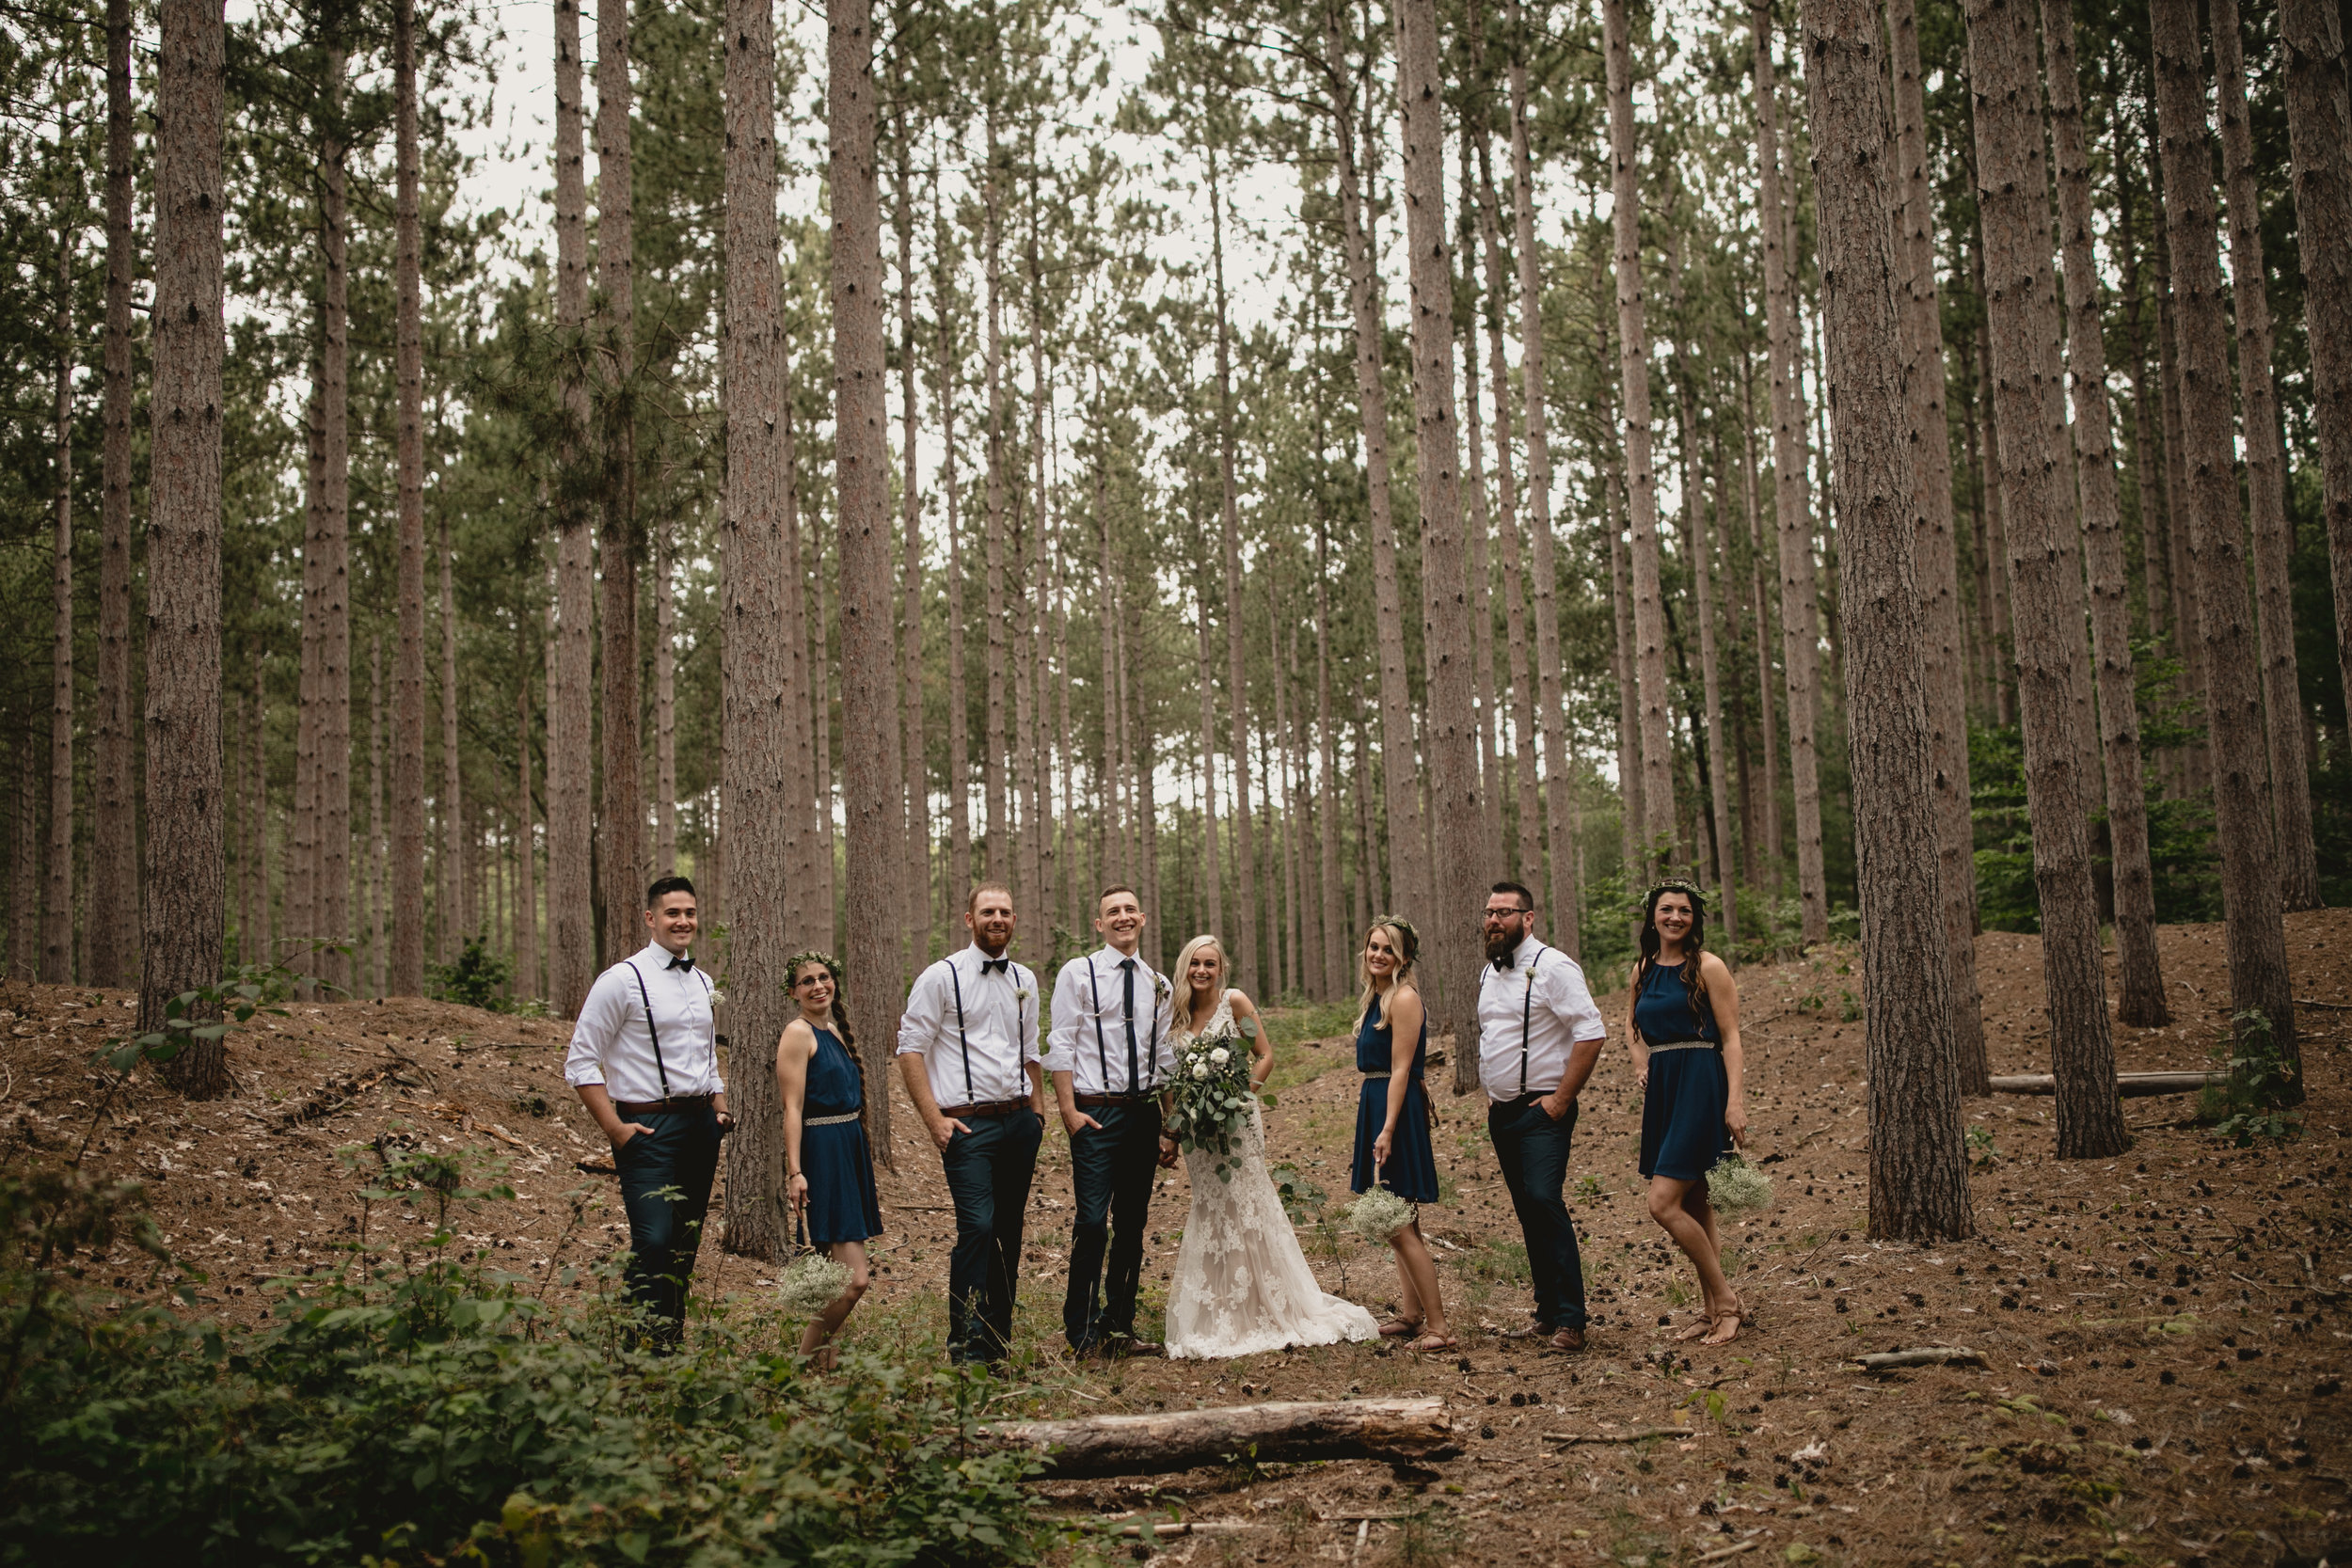 west-michigan-wedding-photographer-whitehall-rachel-austin-chapel-in-the-pines-389.jpg